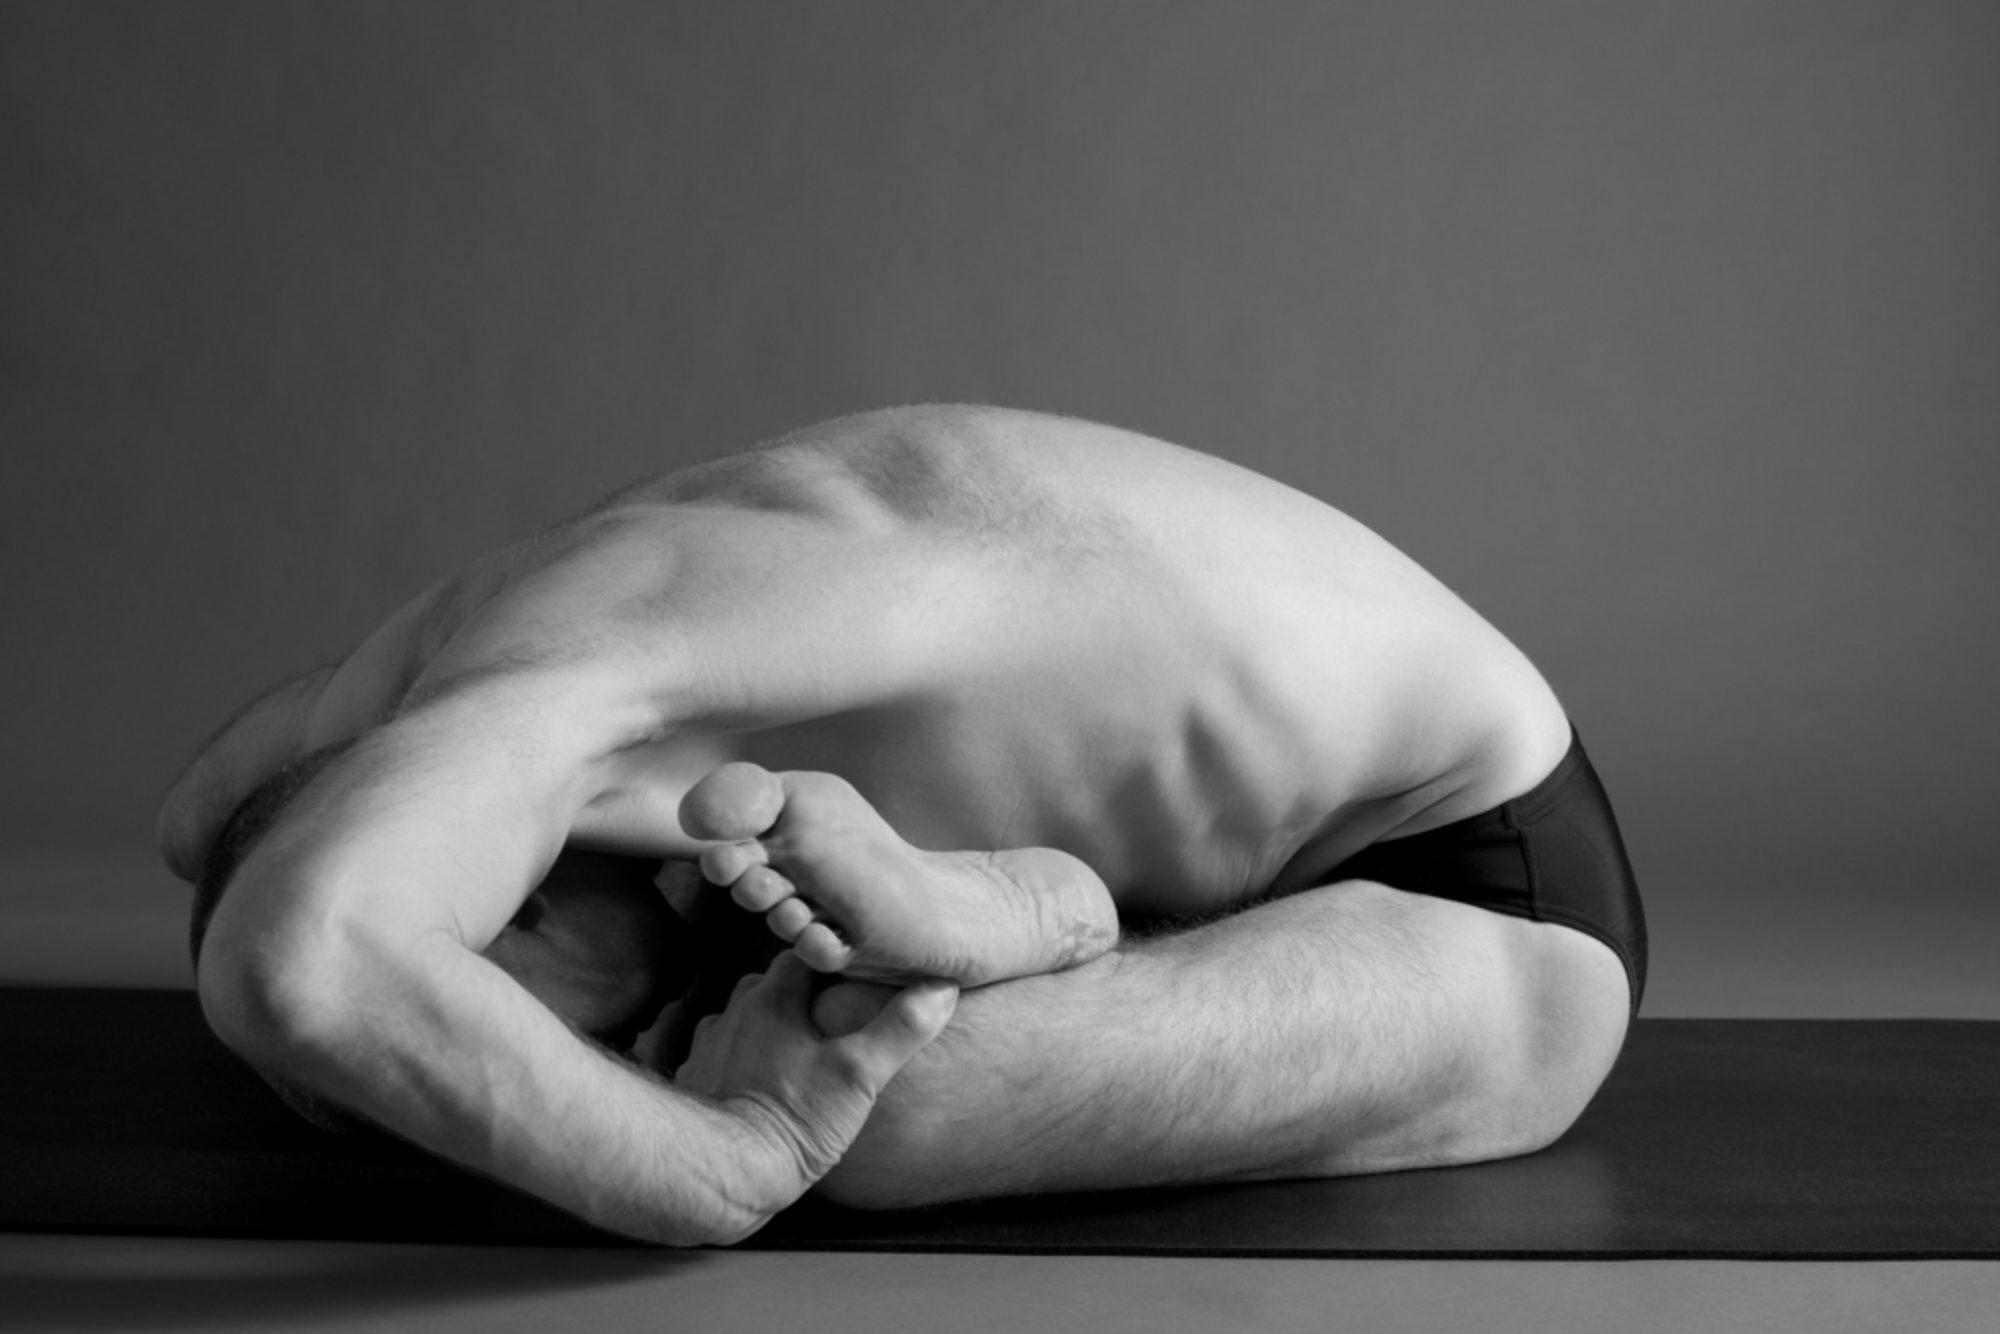 Astánga jóga